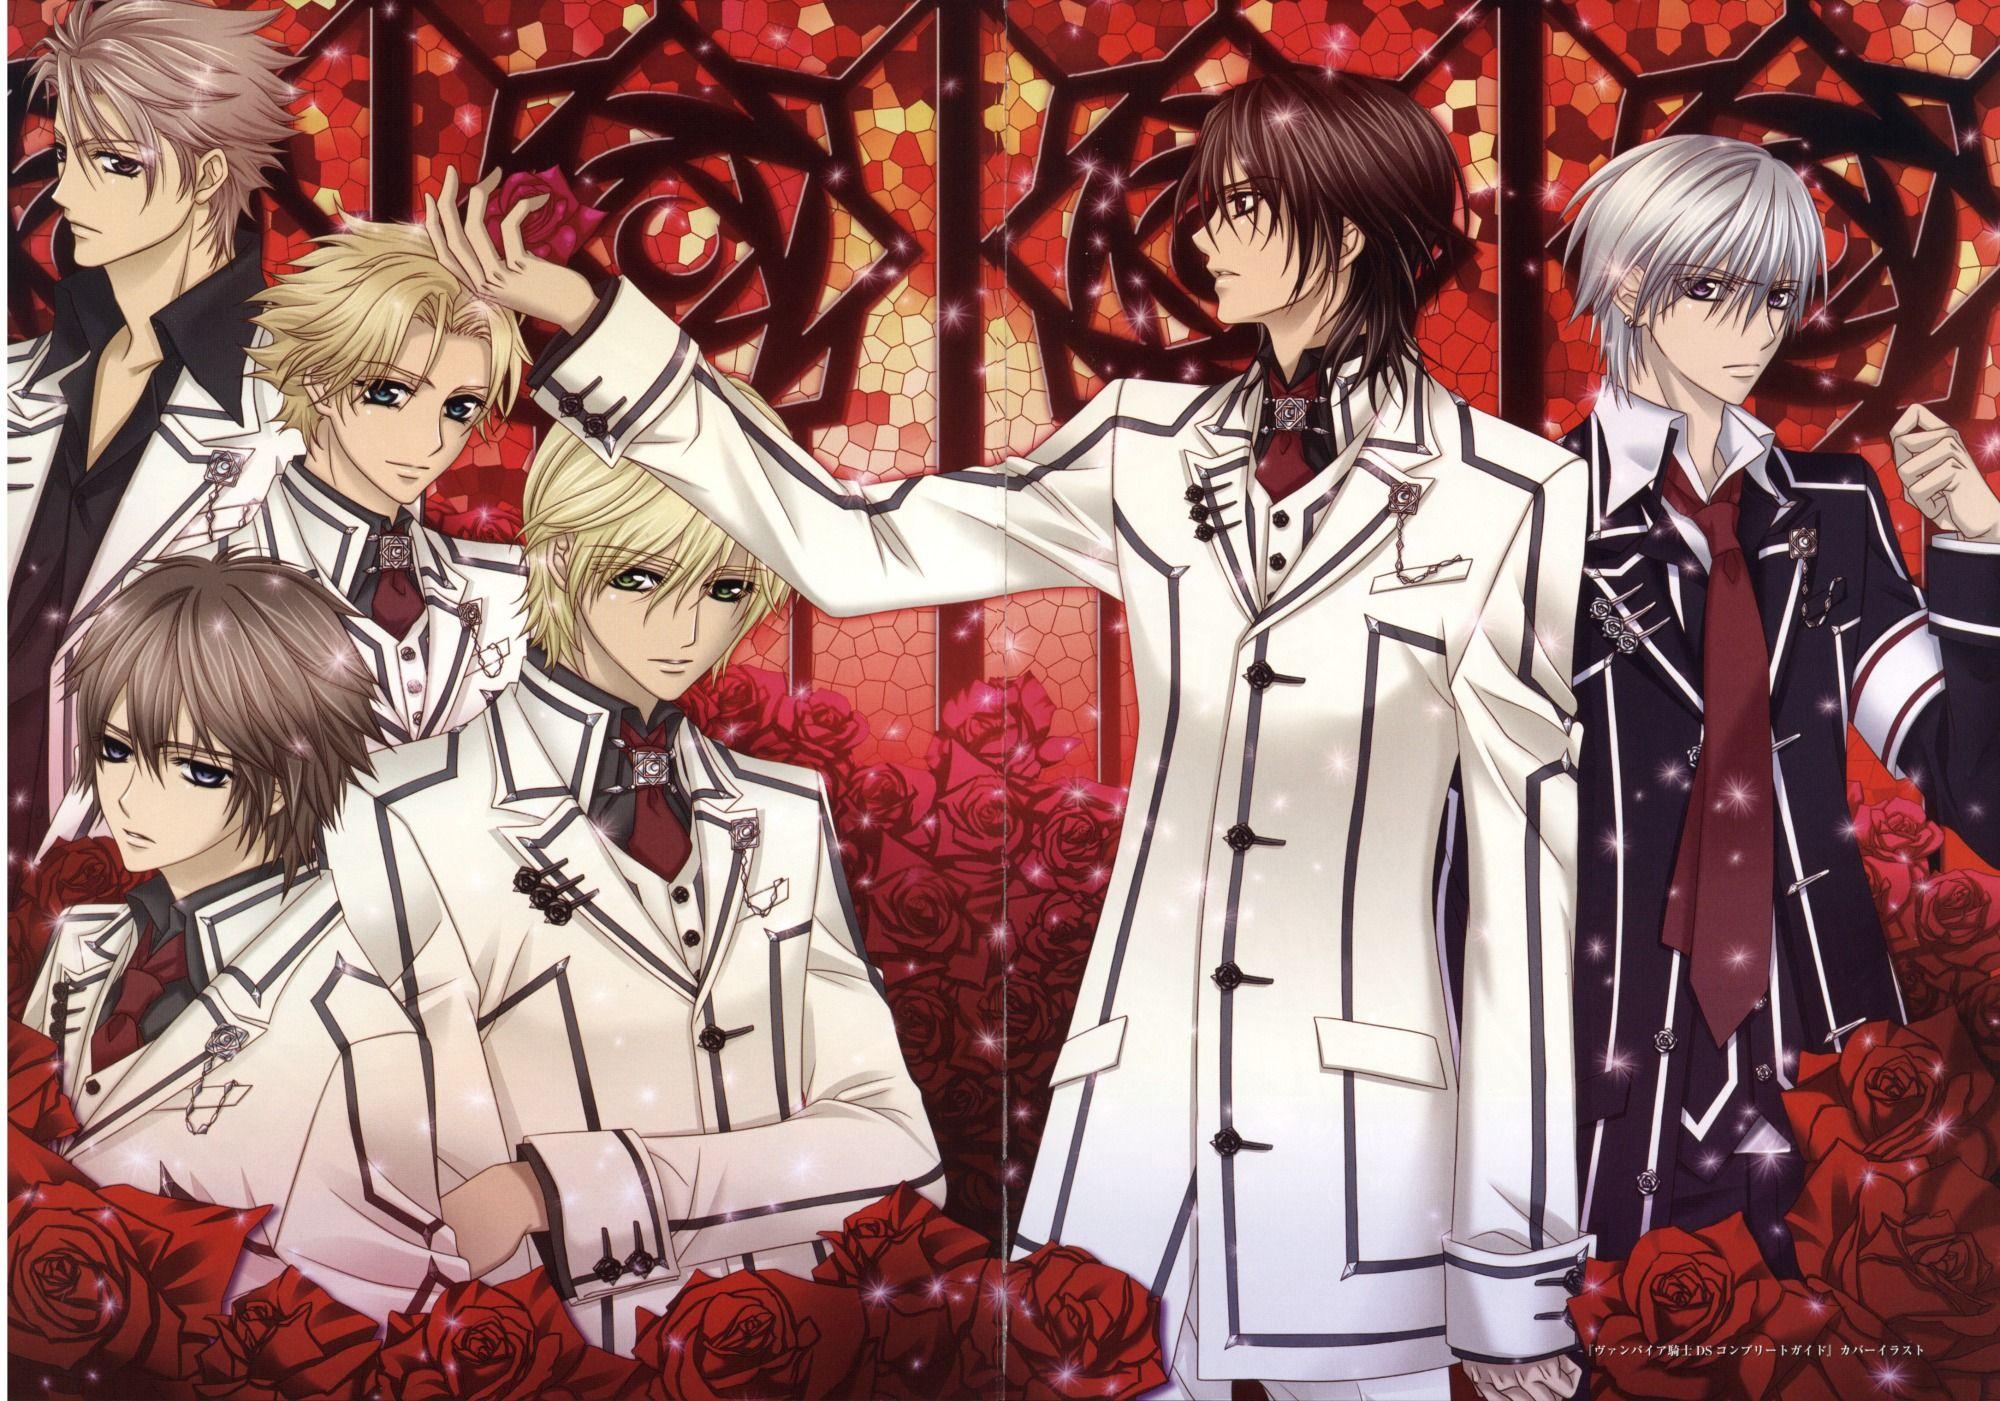 Kain, Aido, Shiki, Ichijo, Kaname and Zero Vampire